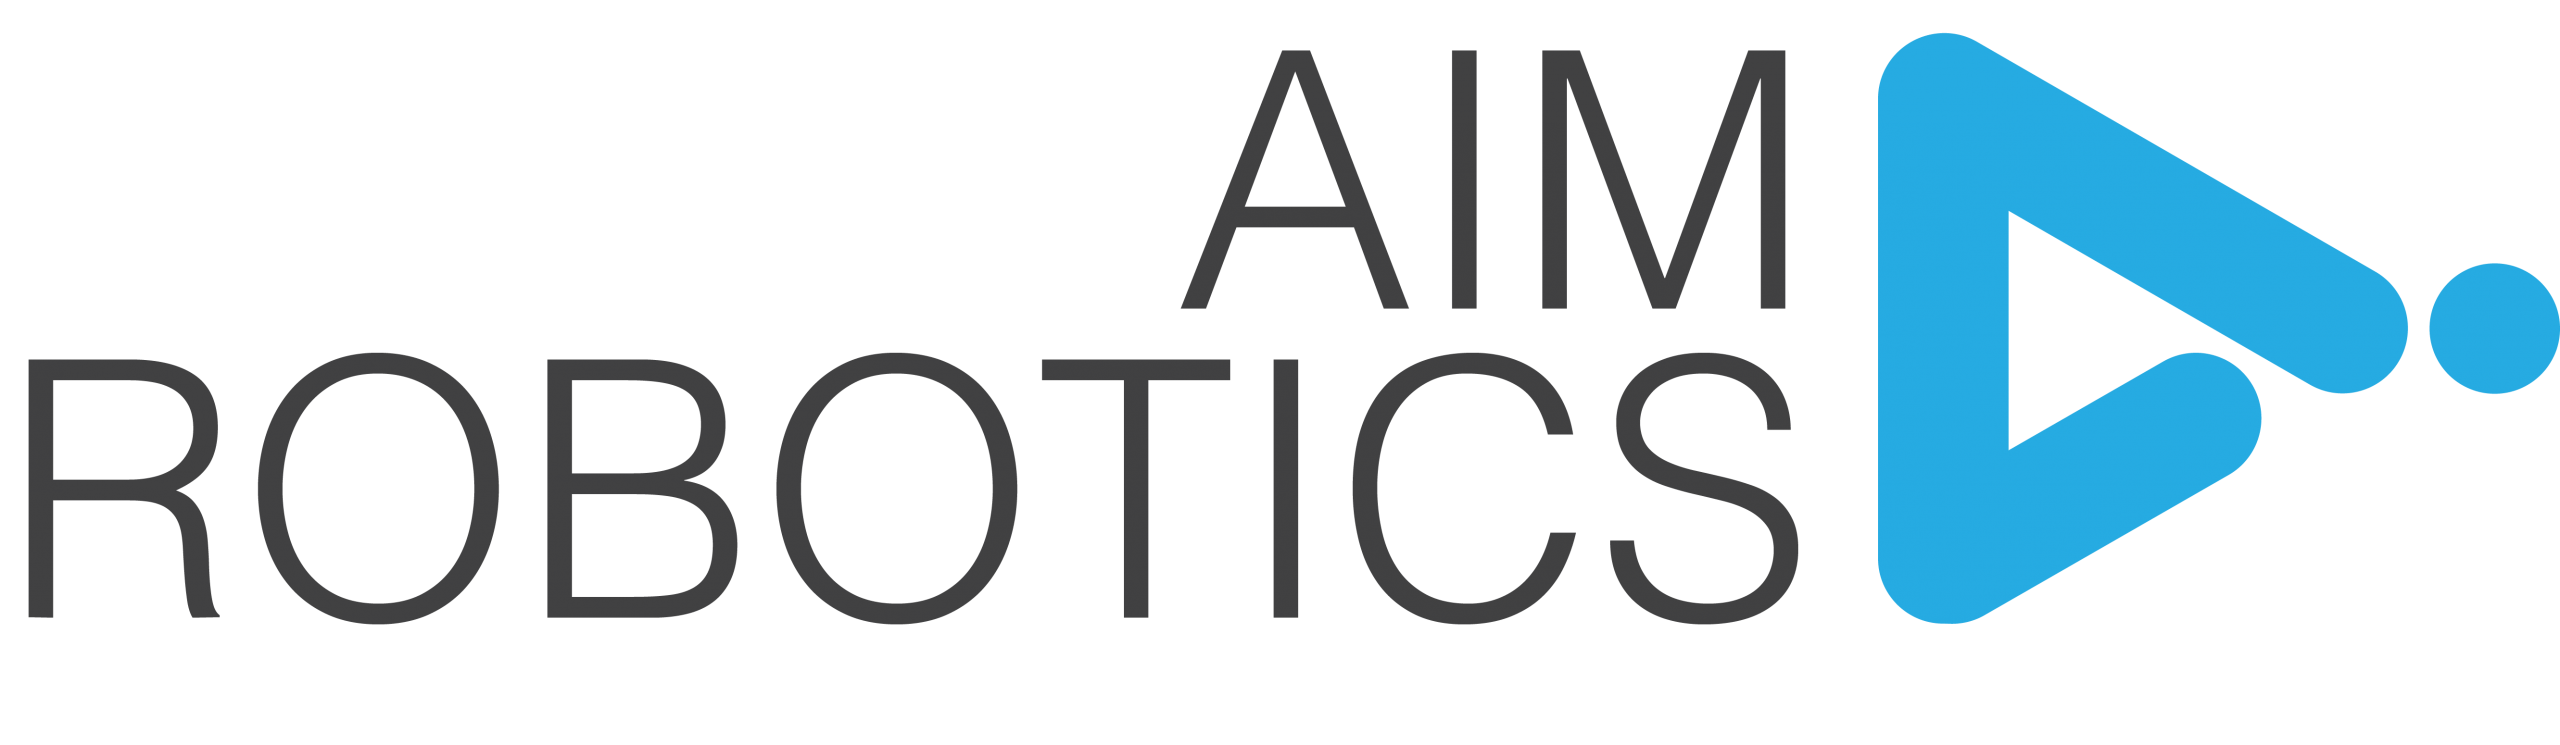 AIM Robotics